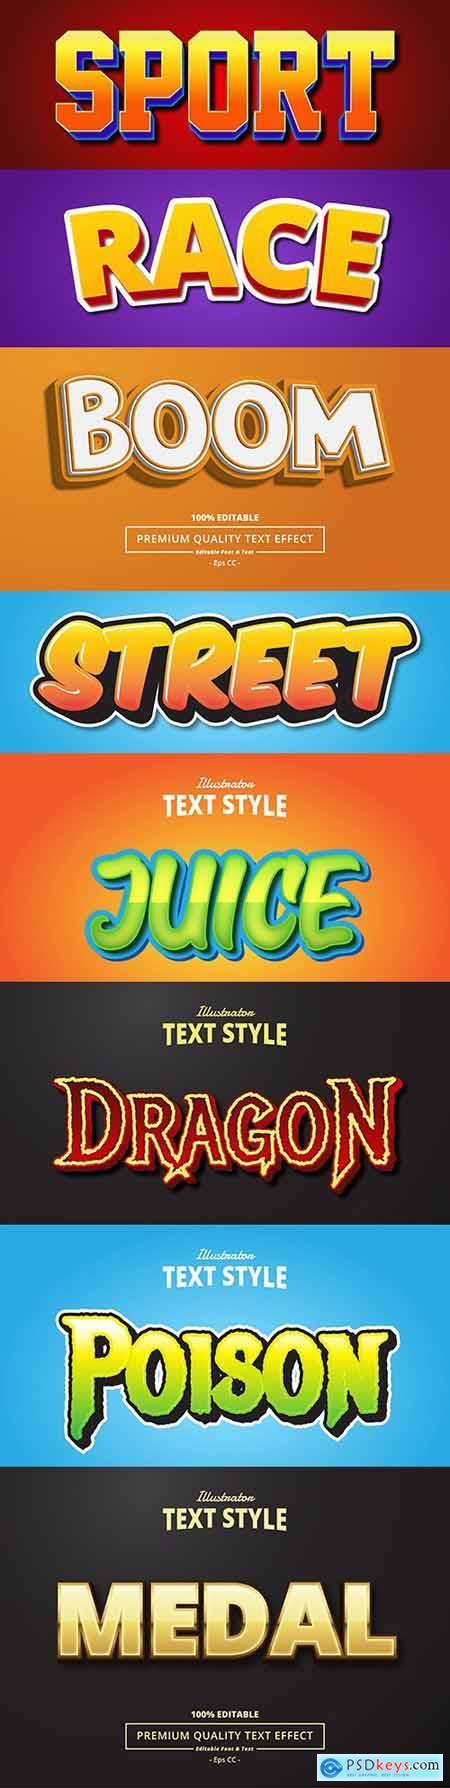 Editable font effect text collection illustration design 101